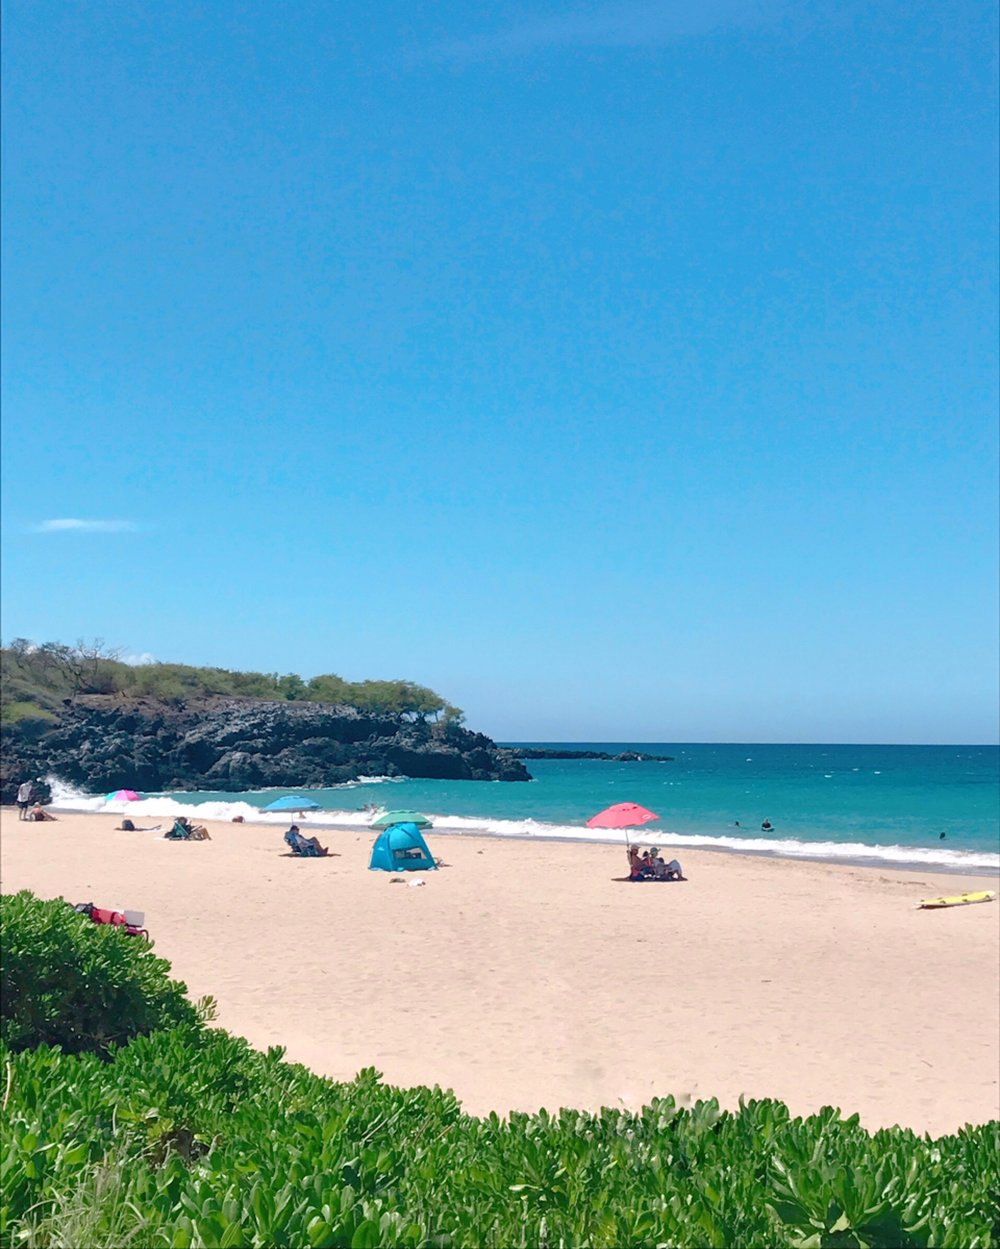 Chill time at Hapuna Beach